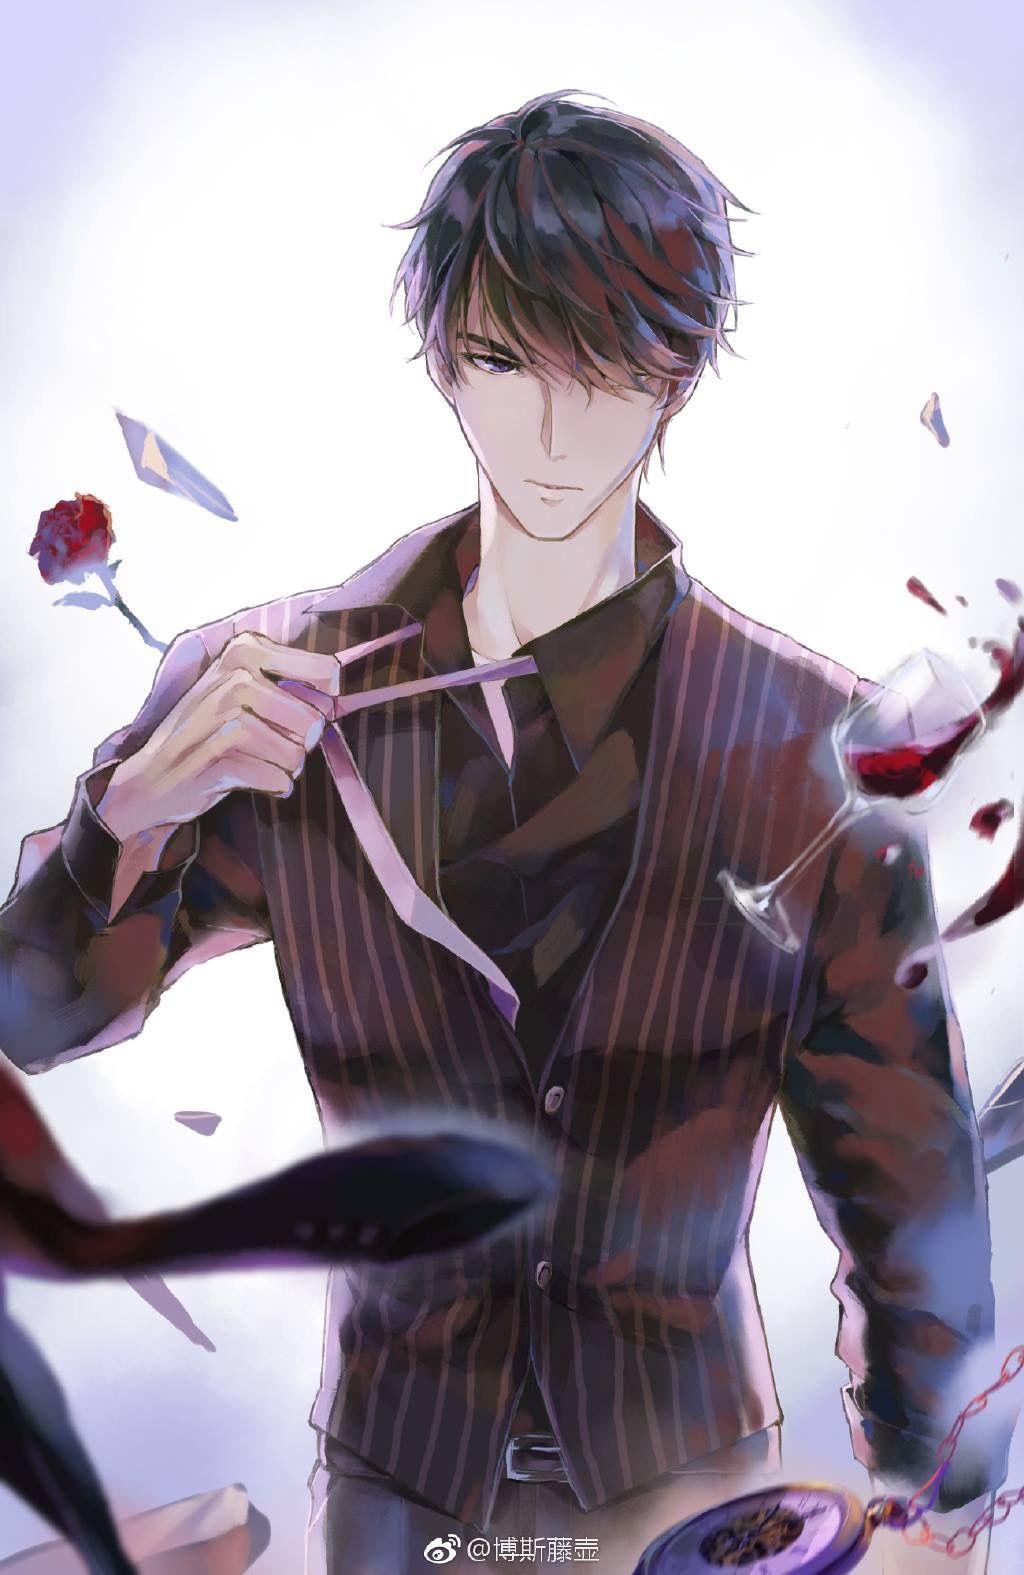 Pin By Audrey Gwaltney On Boy Cool Anime Guys Handsome Anime Guys Handsome Anime